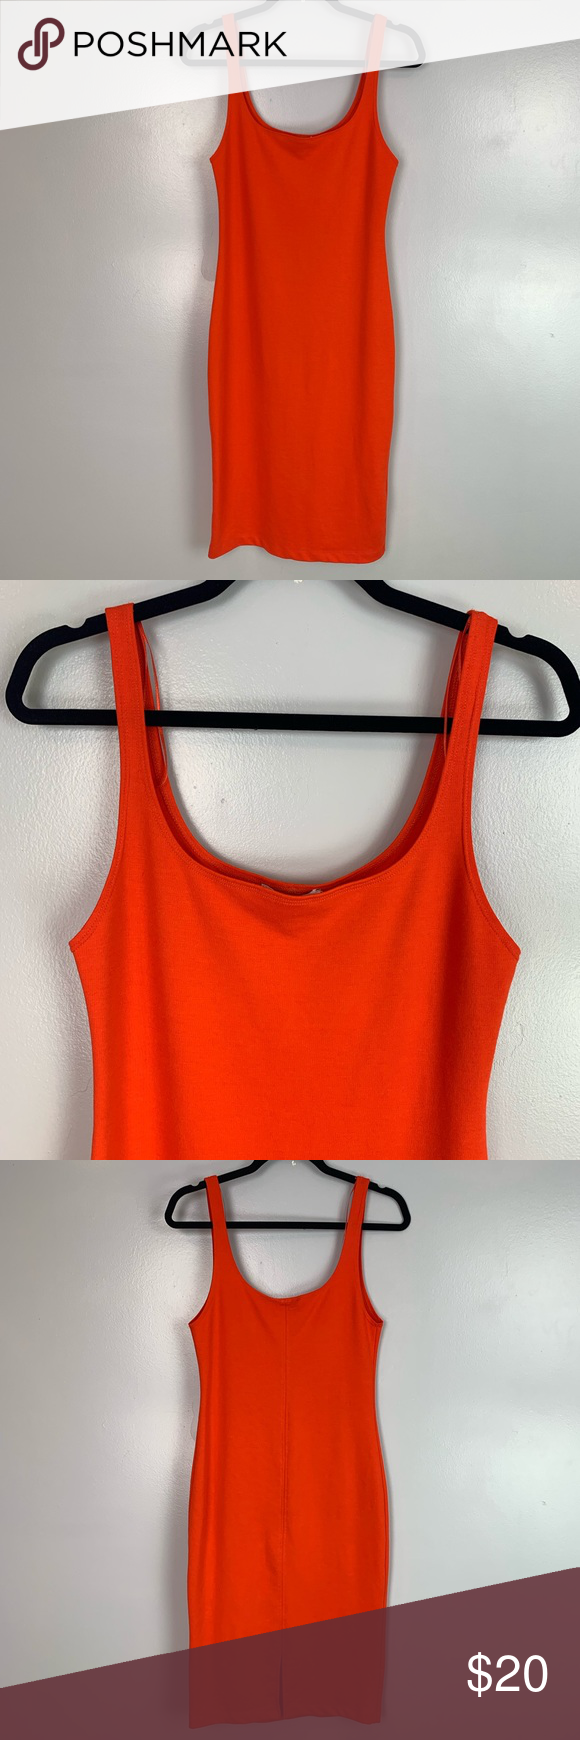 0c8d8d7883b4 Zara Trafaluc sleeveless bodycon dress Zara Trafaluc Women s Bodycon Dress  Orange Sleeveless Size US L Type